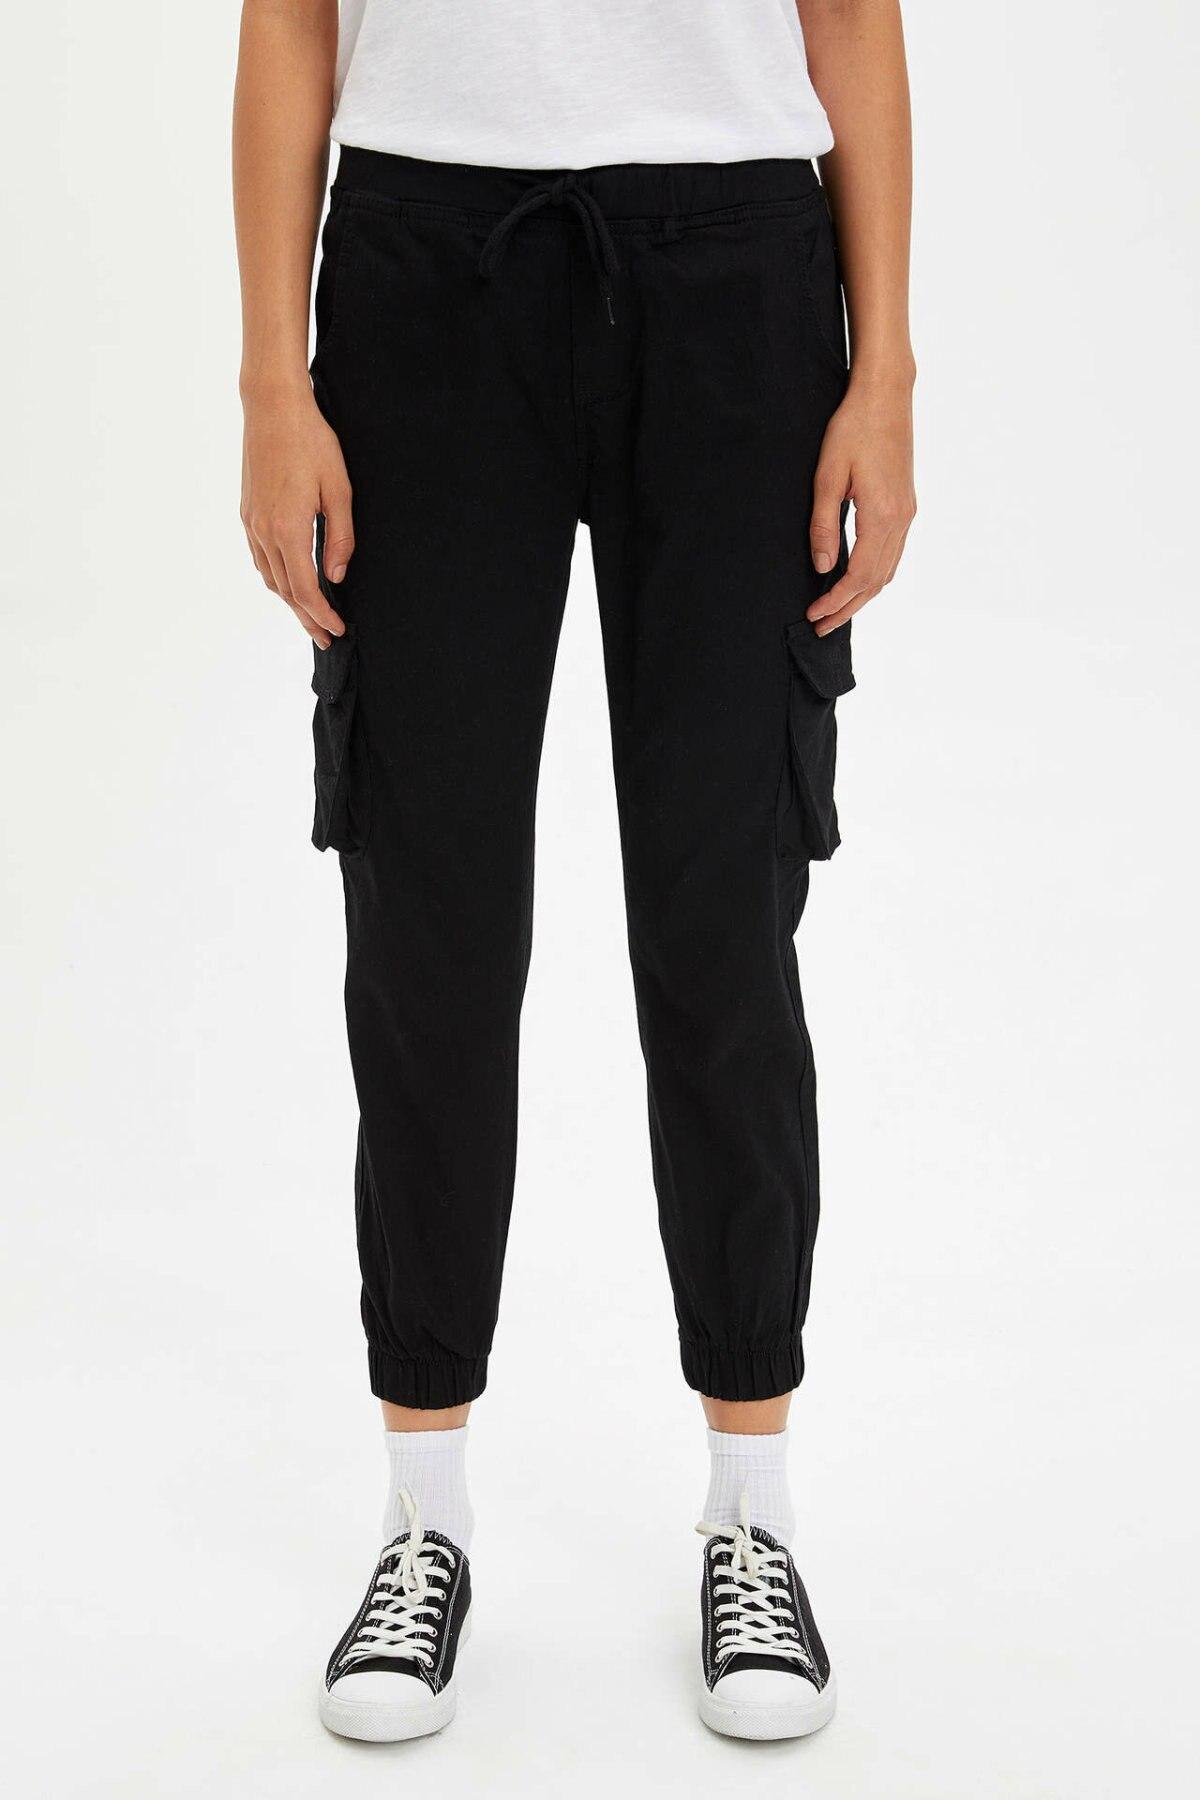 DeFacto Woman Winter Black Ninth Pants Women Casual Pocket Decors Bottom Lady Cargo Pants Trousers-N1422AZ19WN